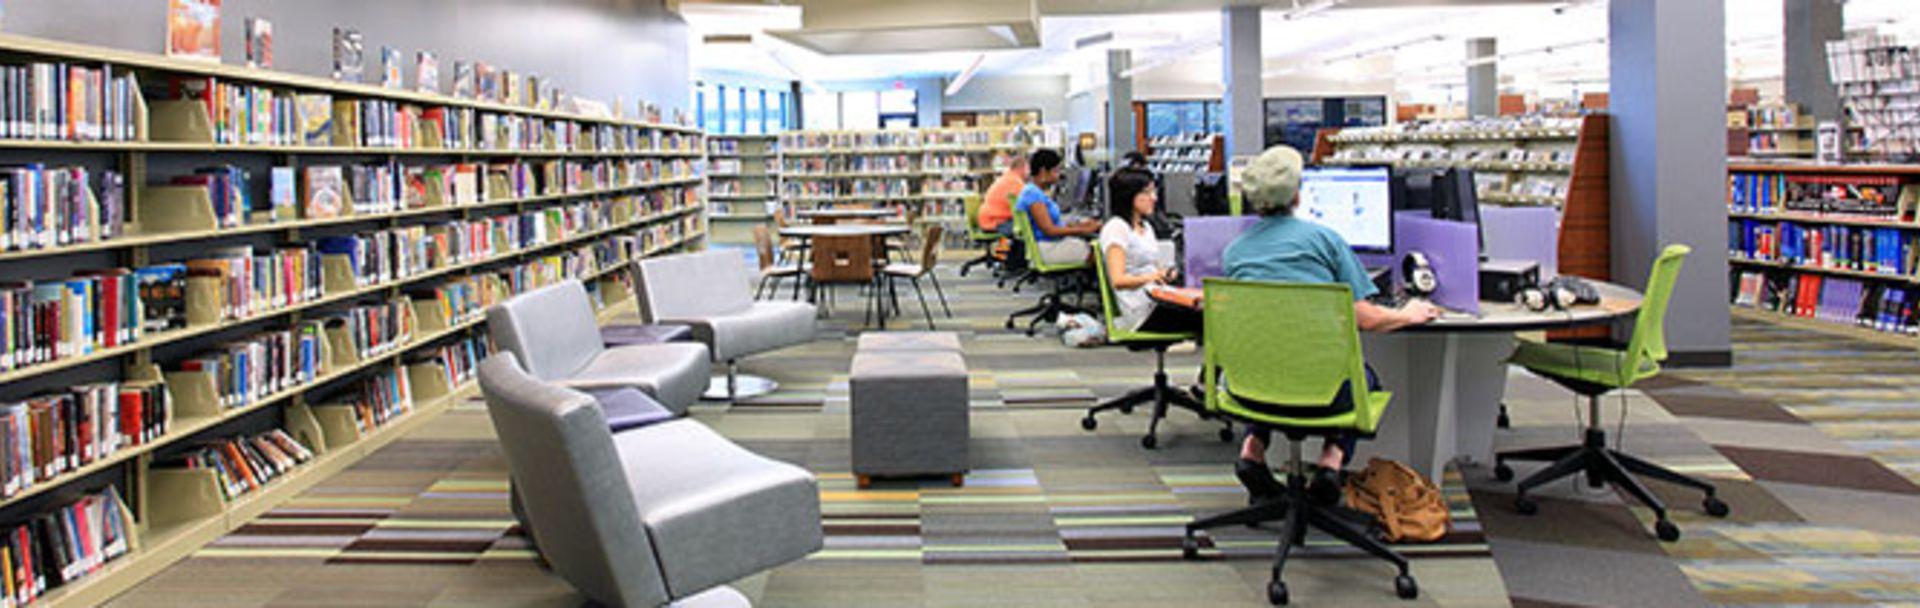 Best Kept Secret: The Keller Public Library